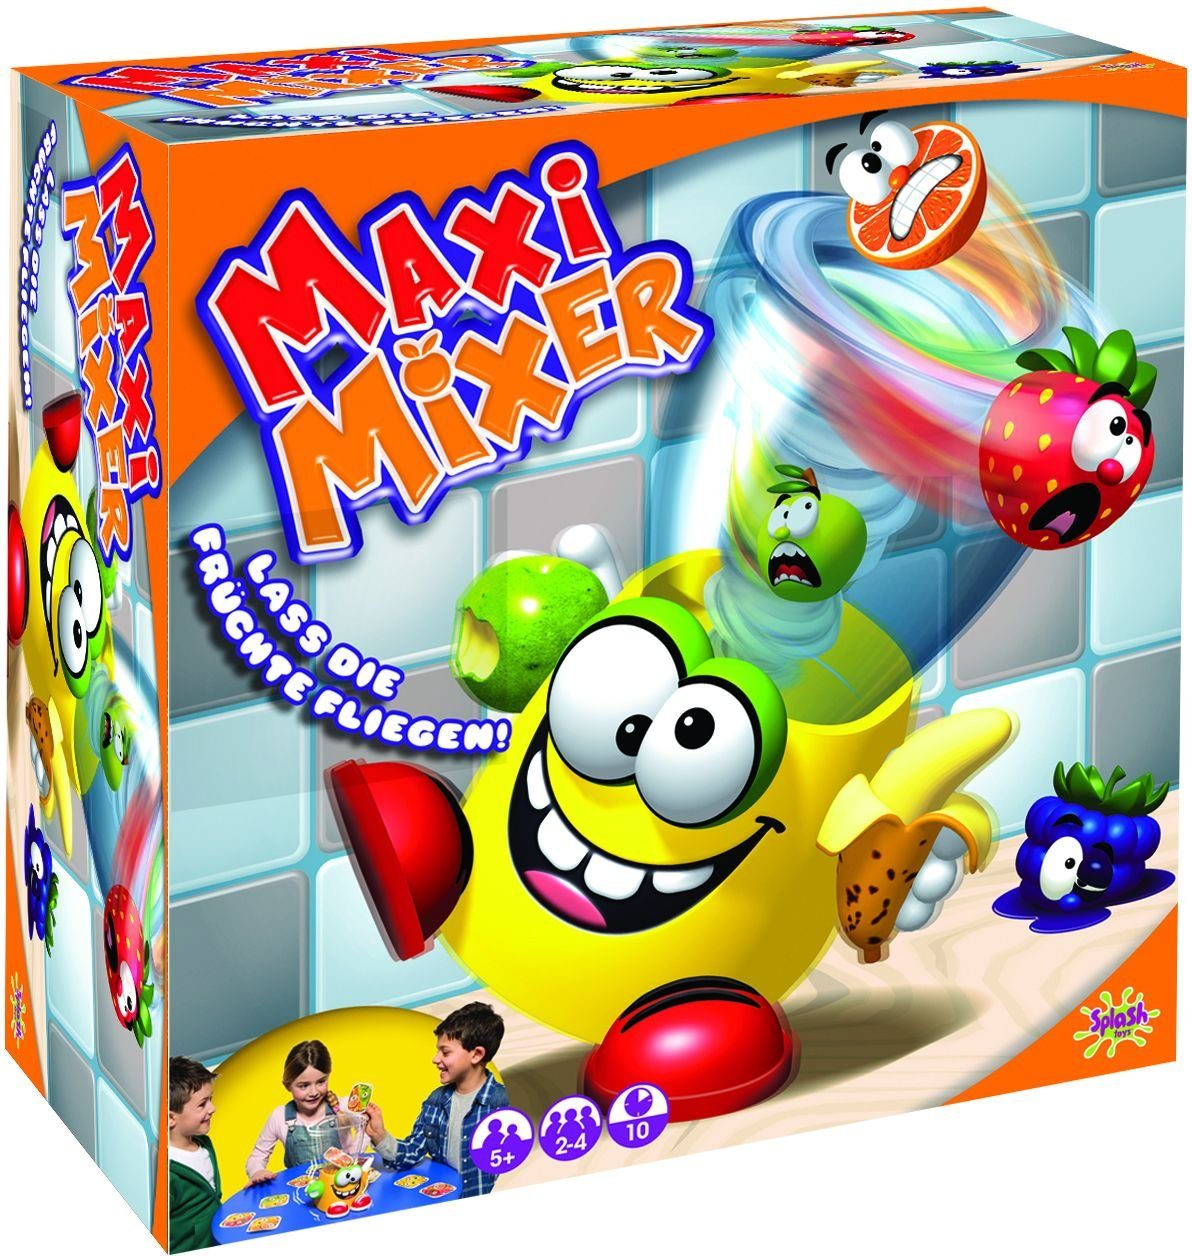 Splash Toys Gesellschaftsspiel, »Maxi Mixer«